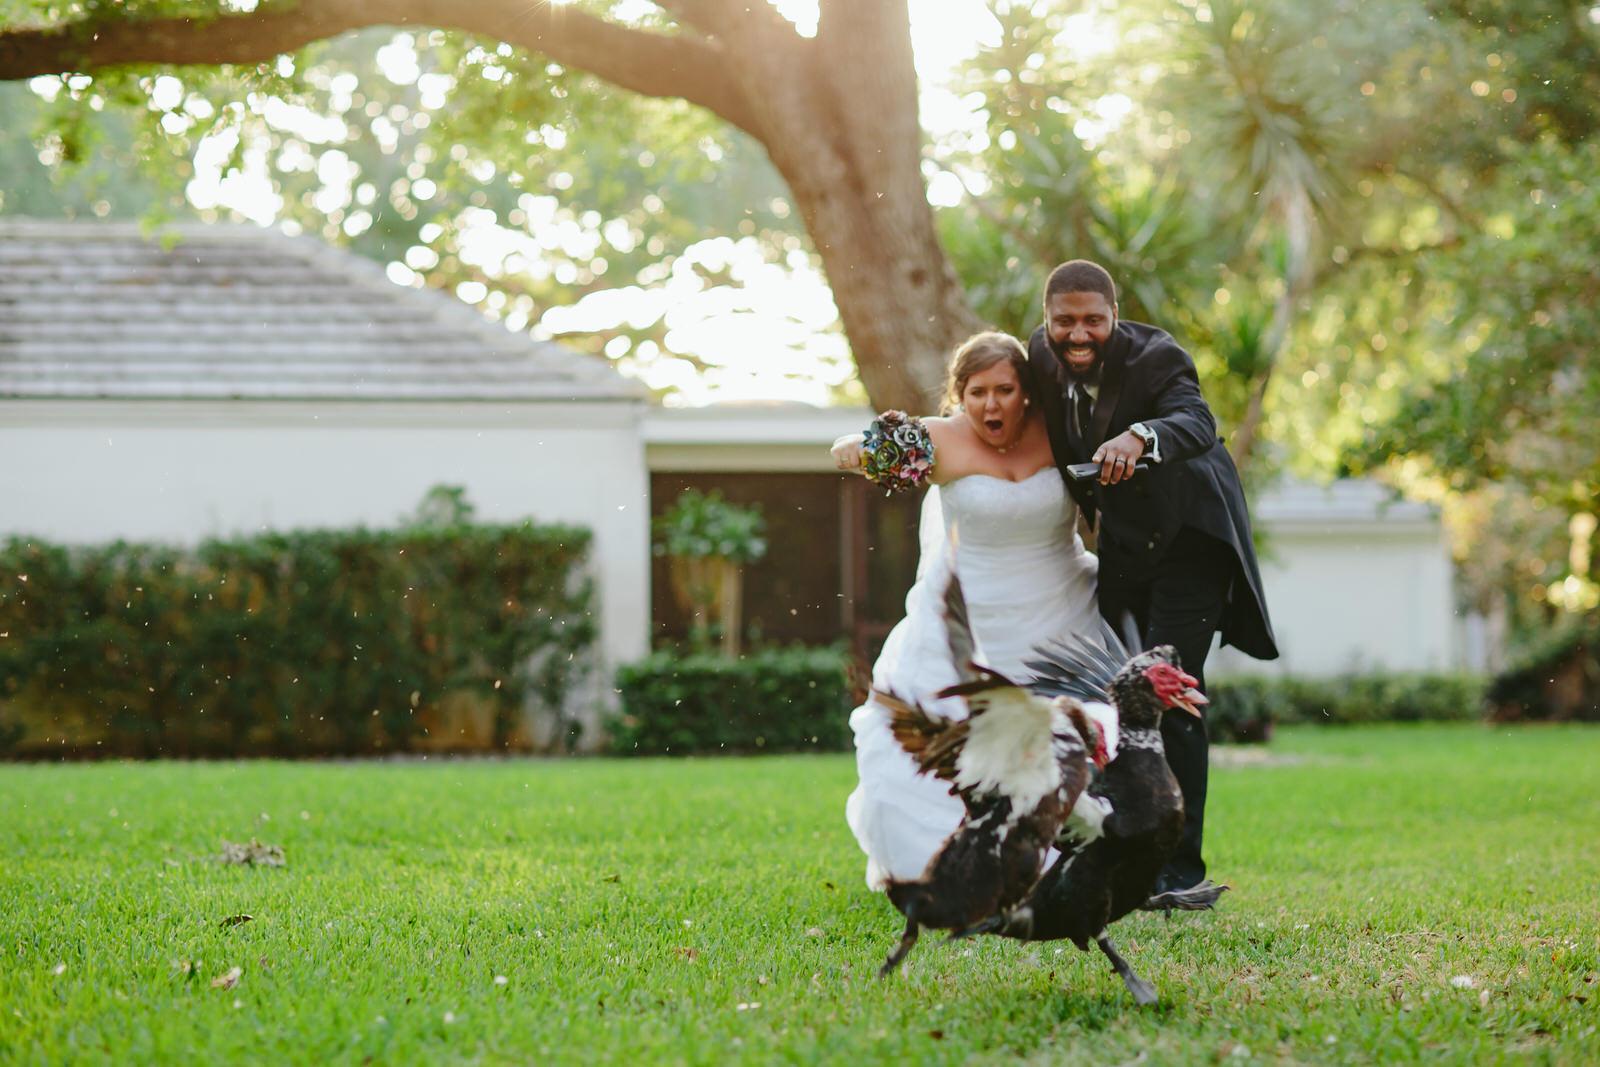 duck-brawl-wedding-portrait-tiny-house-photo-moments-south-florida-wedding-photographer.jpg